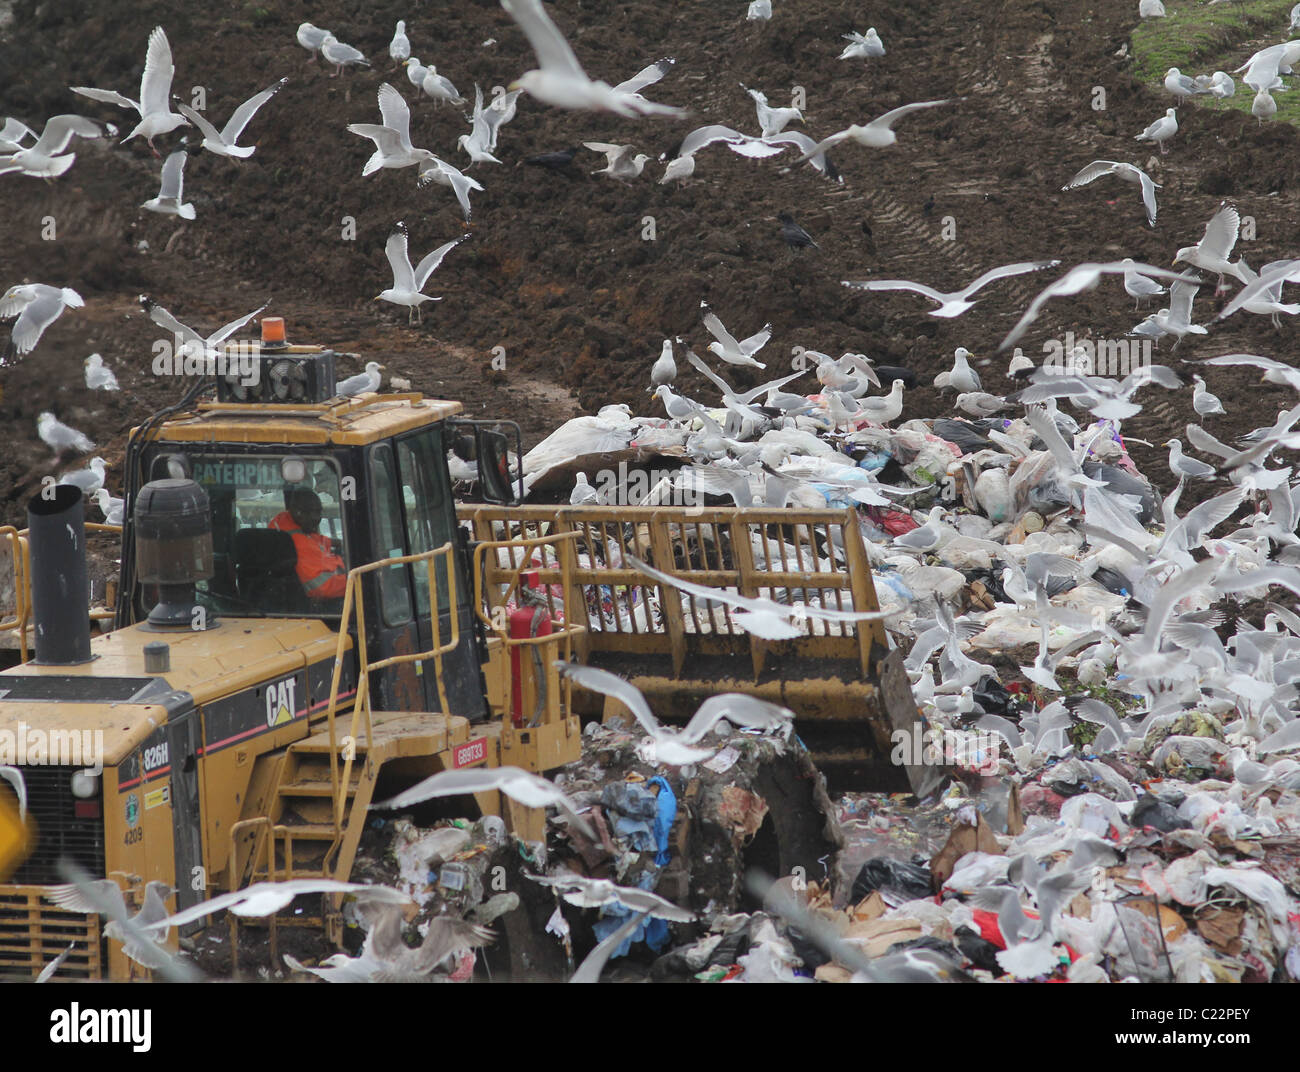 bulldozer landfill gulls Palo Alto Baylands Park California - Stock Image